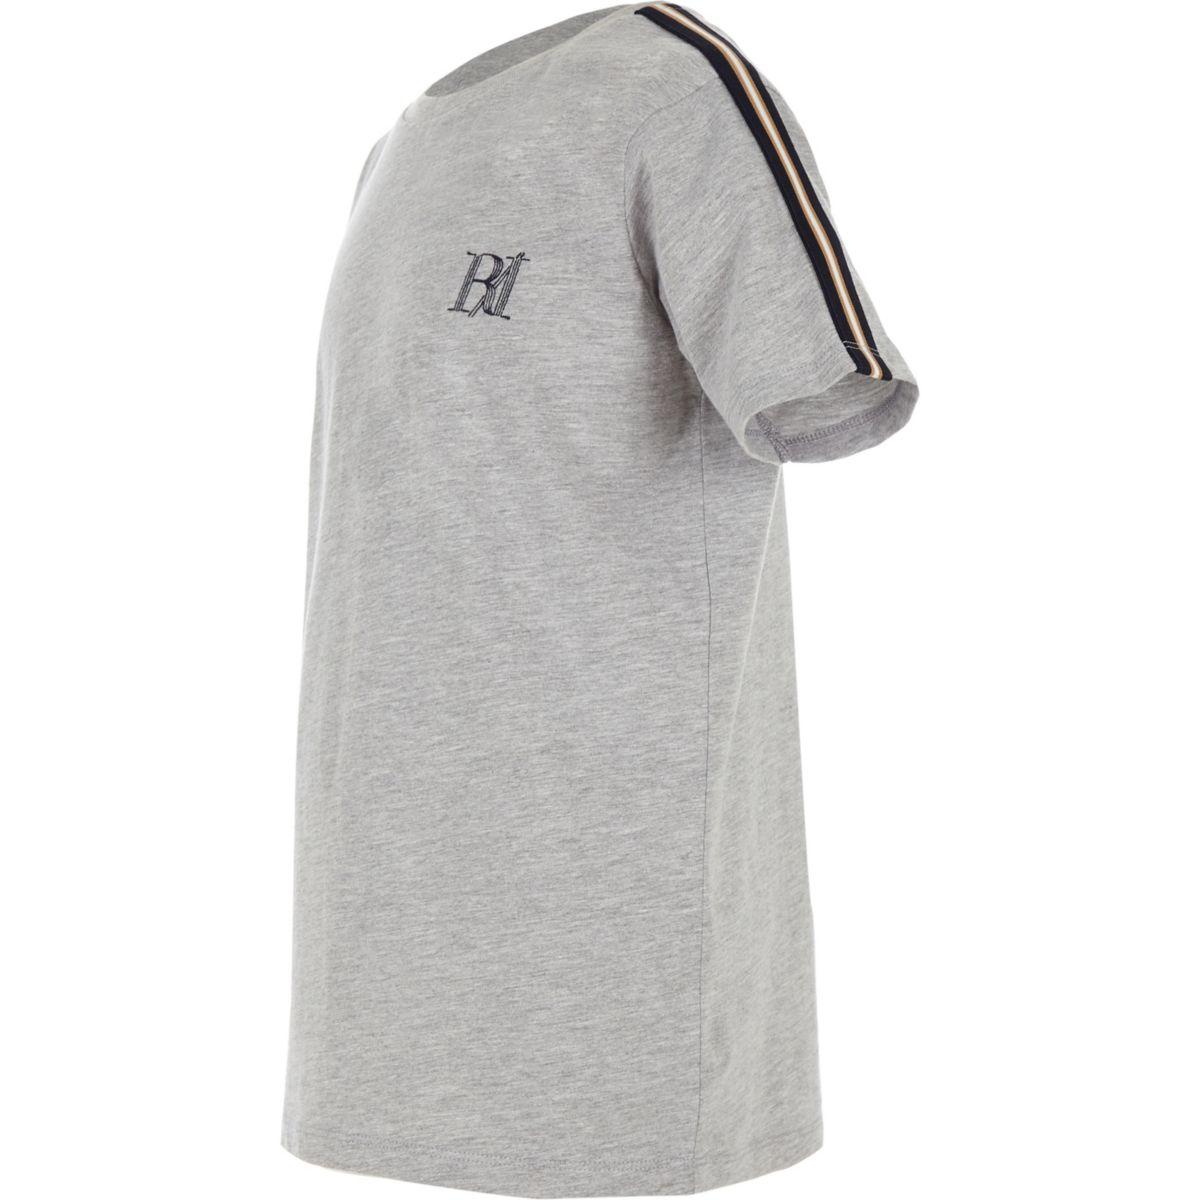 Boys grey tape sleeve T-shirt